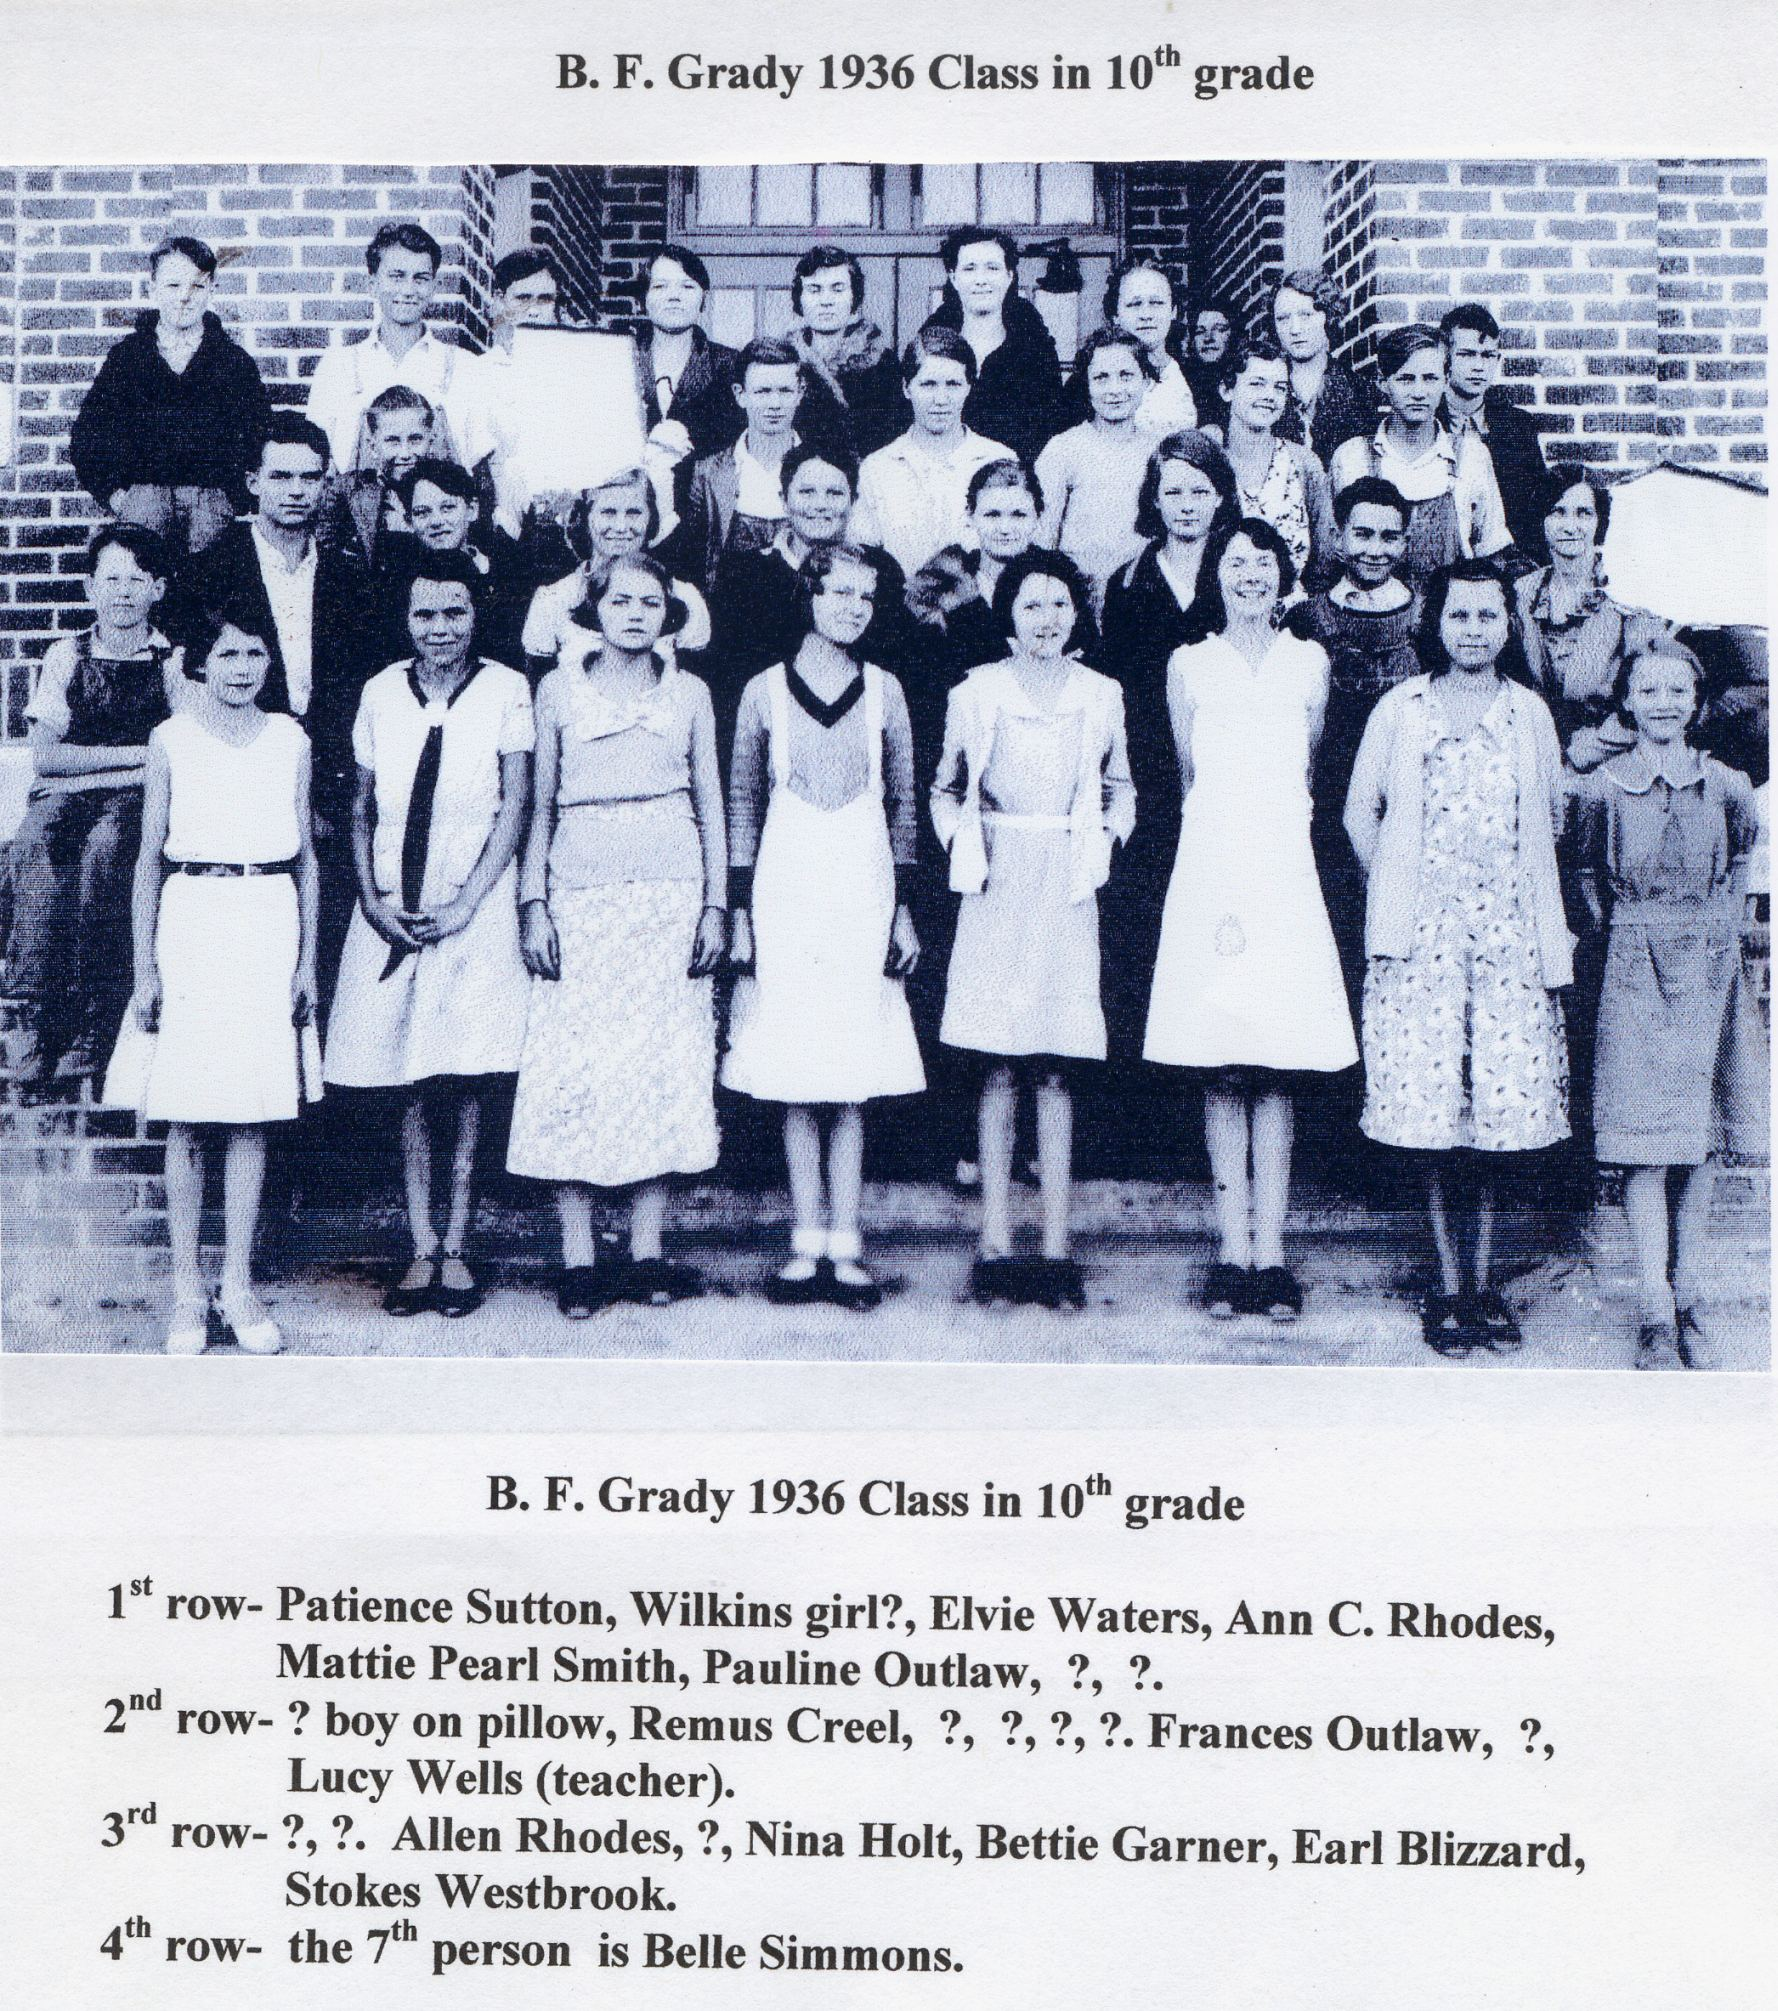 BFG 1936 Class in 10th grade